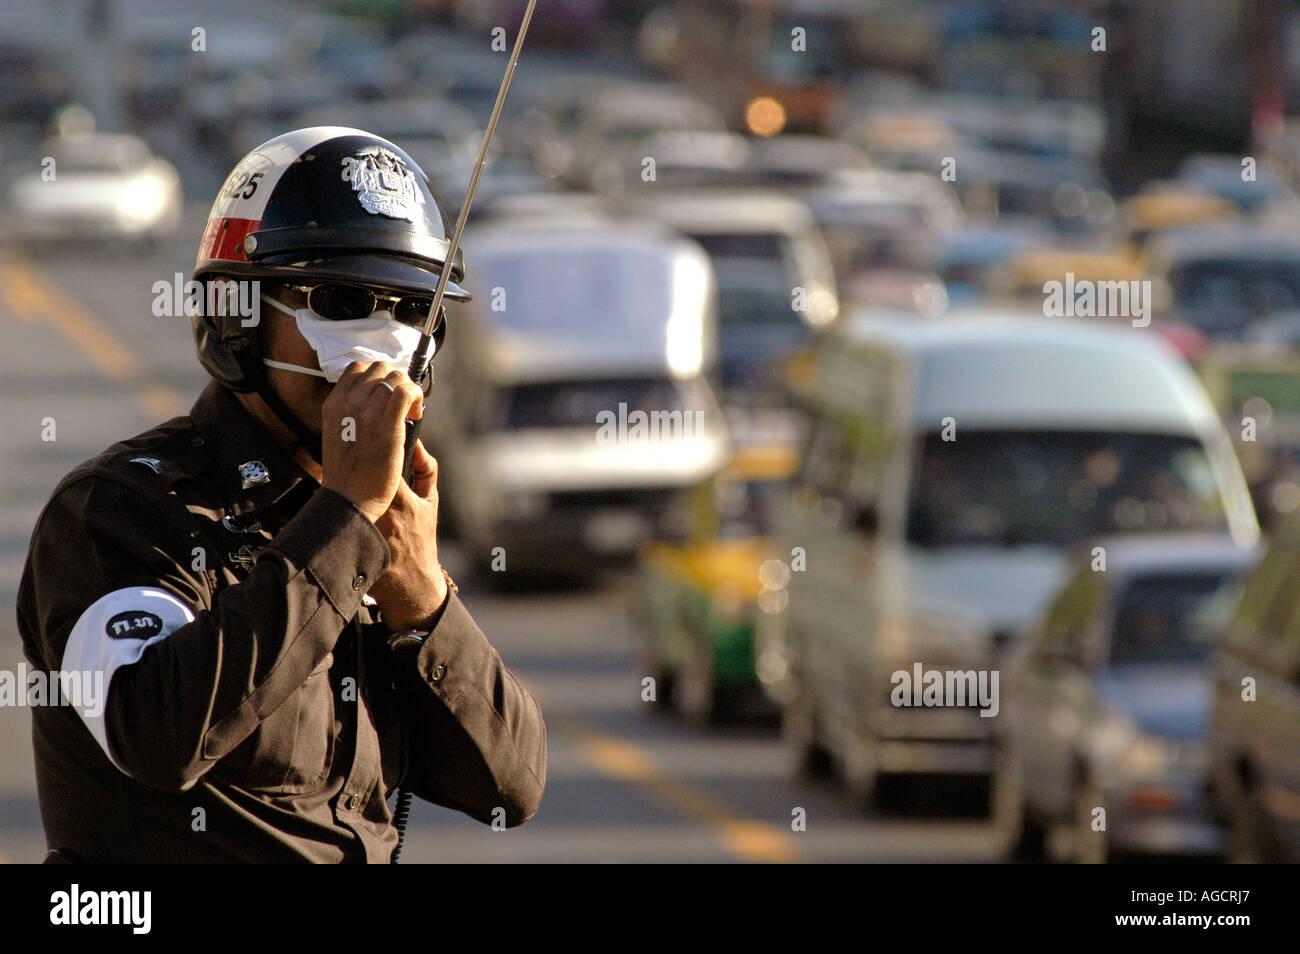 Verkehrspolizei, Bangkok, Thailand Stockfoto, Bild: 8097126 - Alamy